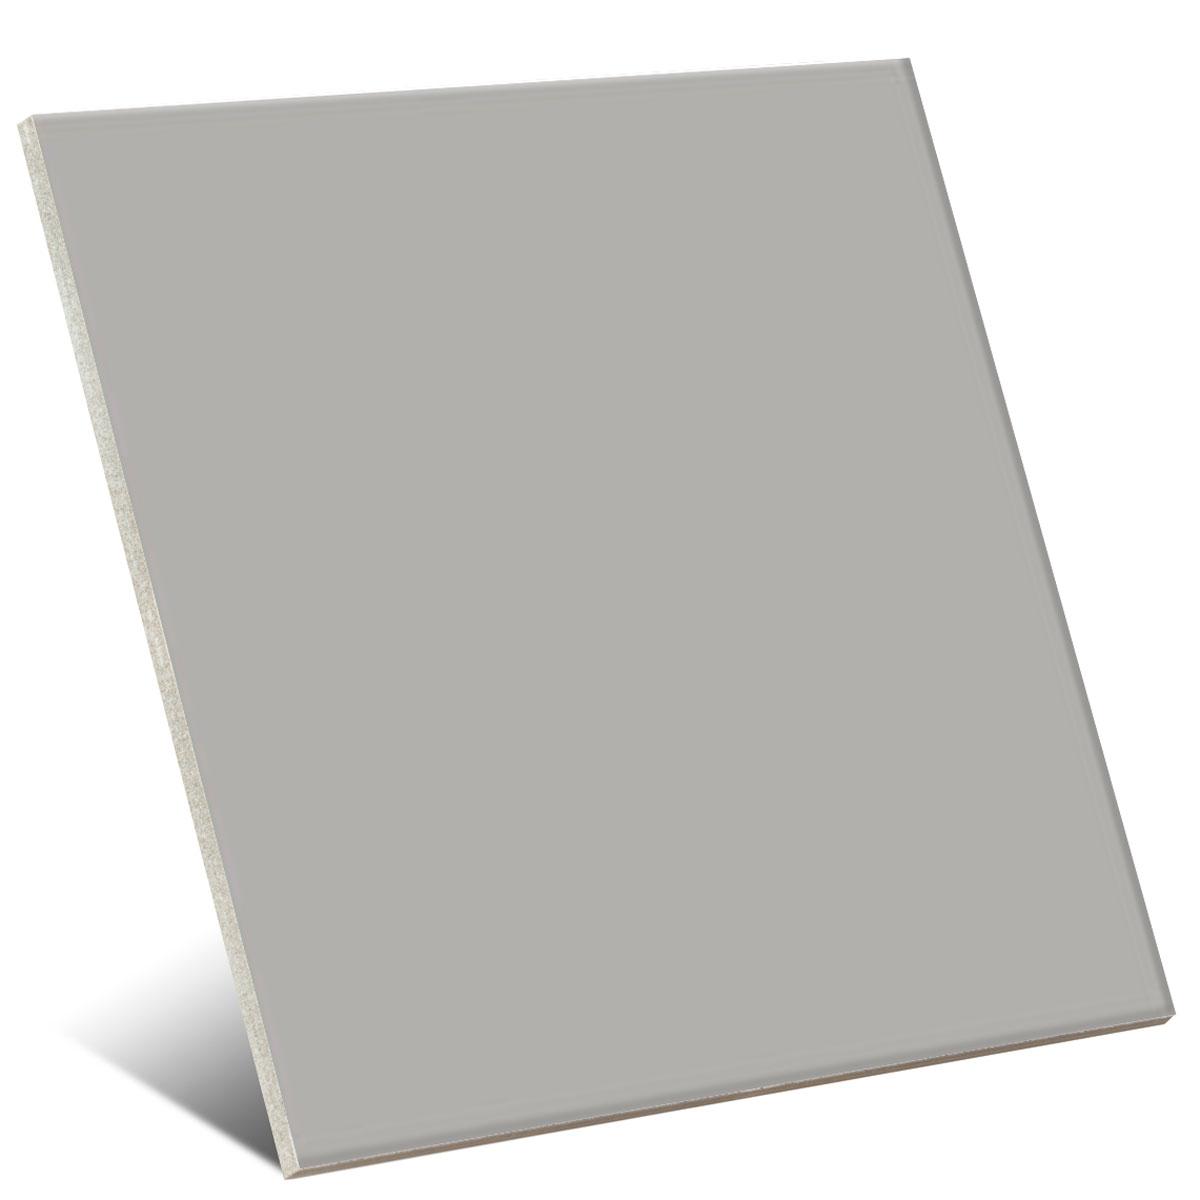 Color Gris Perla Brillo 20x20 cm (caja 1 m2)